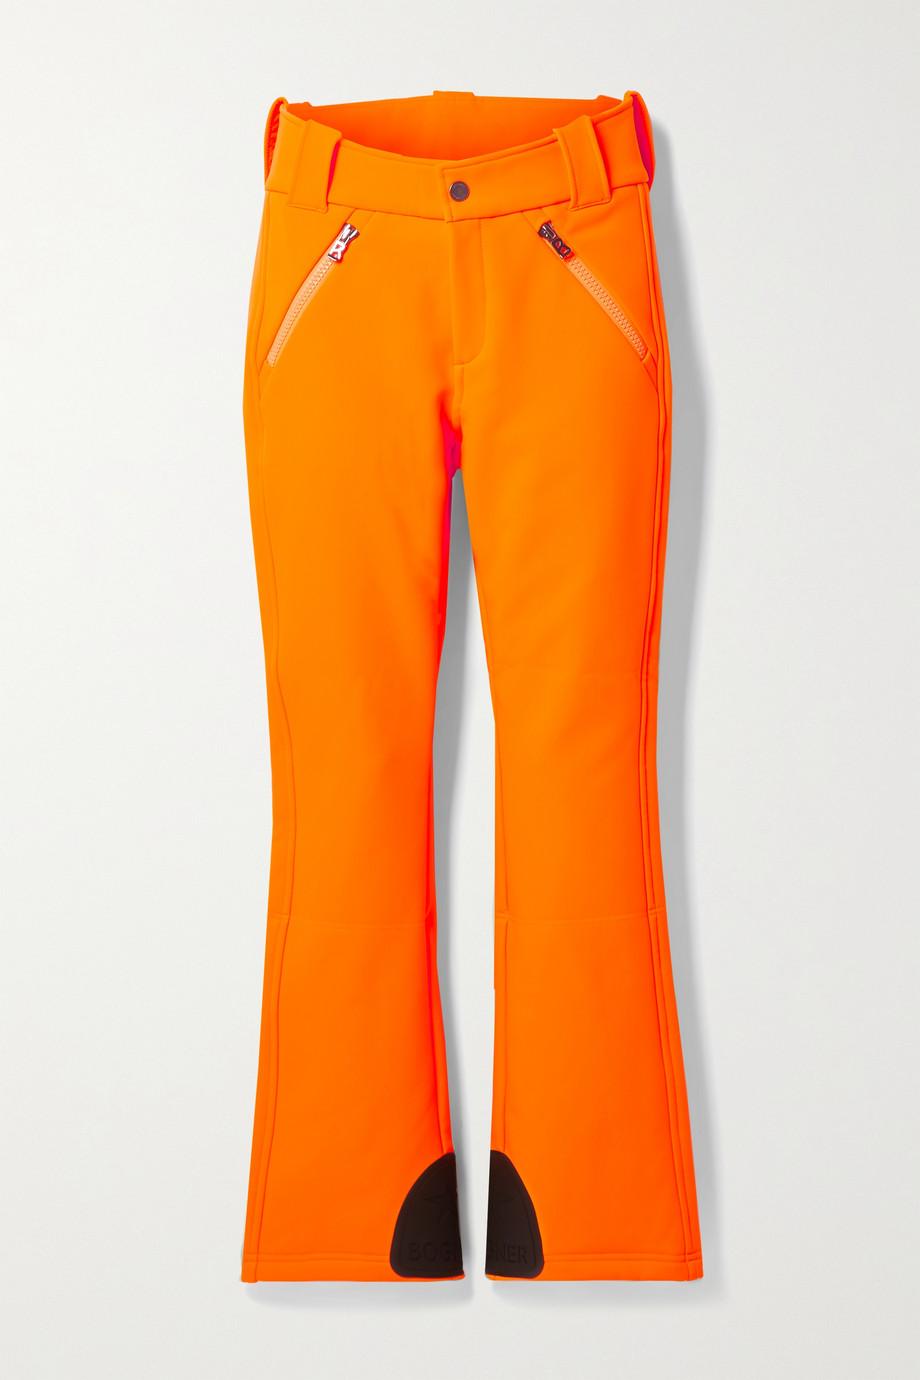 Bogner Haze bootcut ski pants